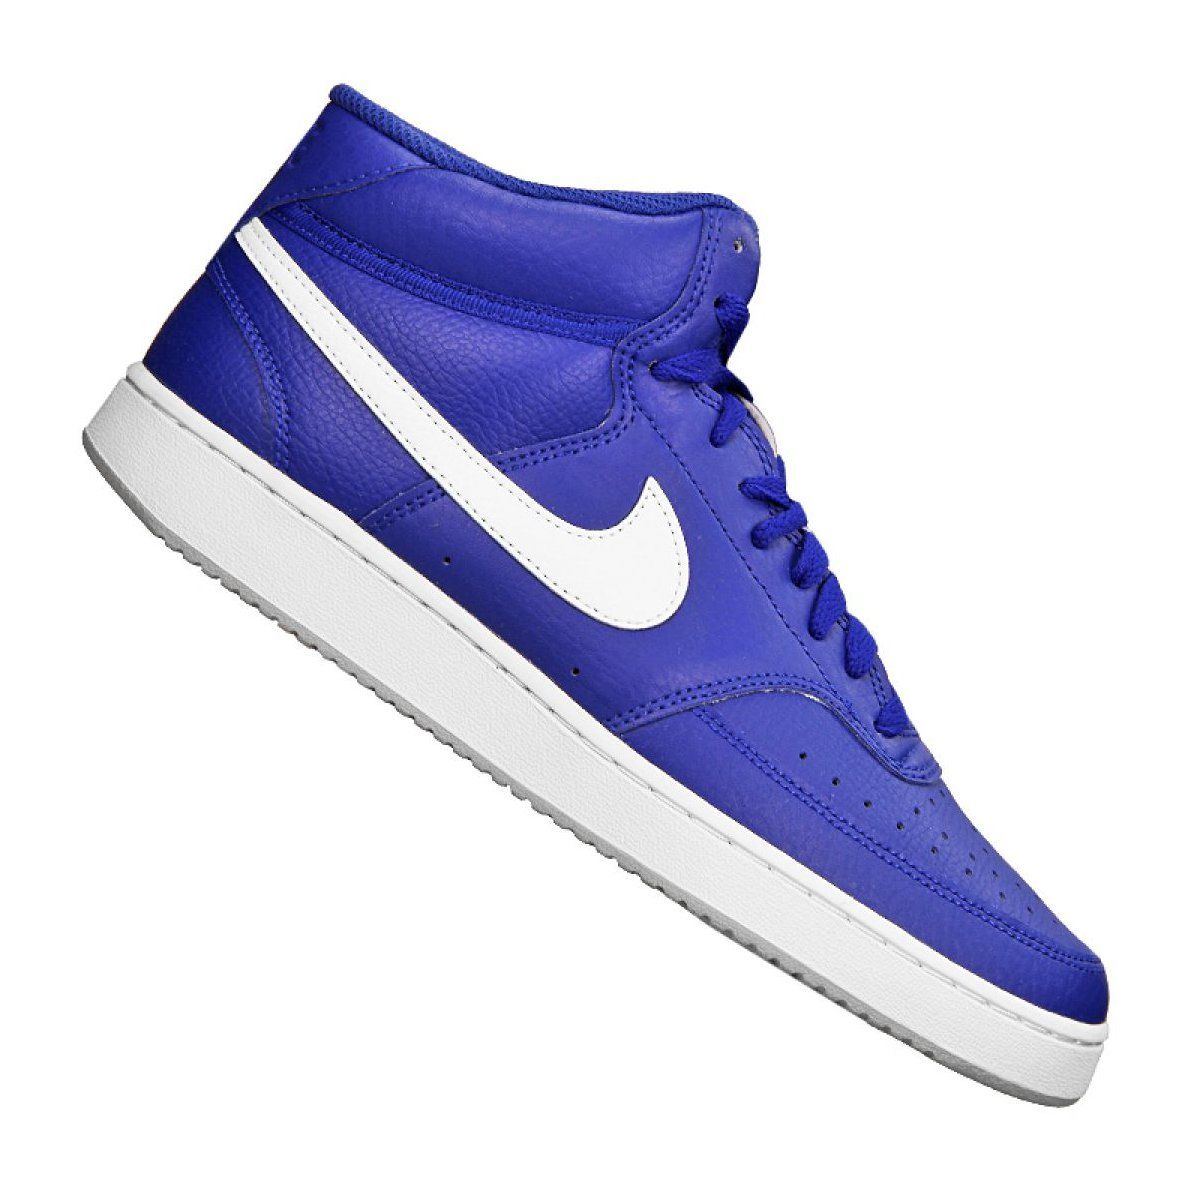 Buty Nike Court Vision Mid M Cd5466 400 Niebieskie Blue Shoes Mens Nike Shoes Nike